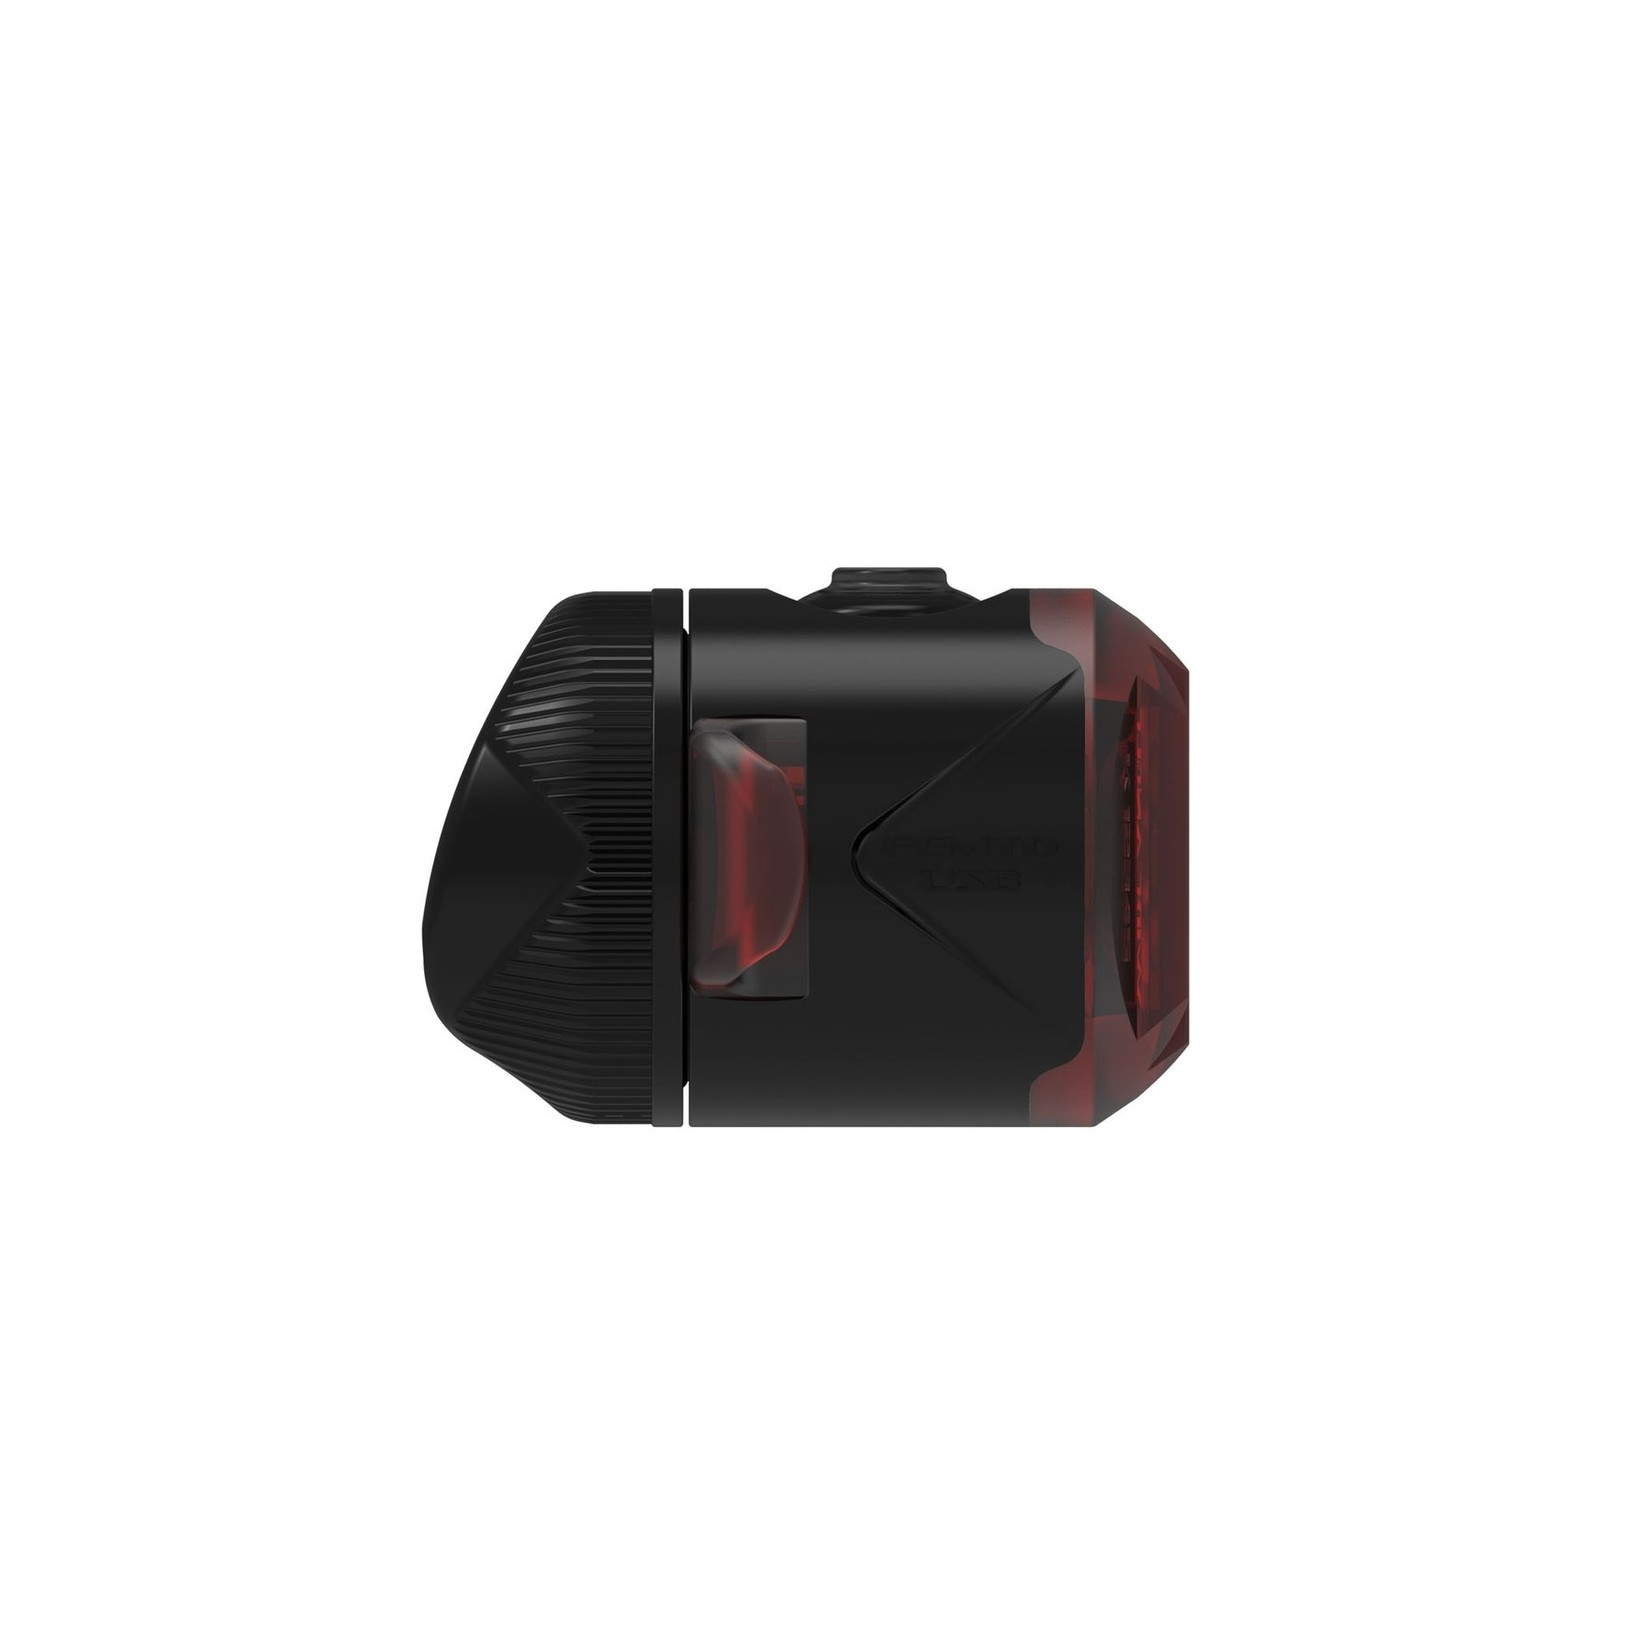 Lezyne FEMTO USB DRIVE BOX SET REAR BLACK single